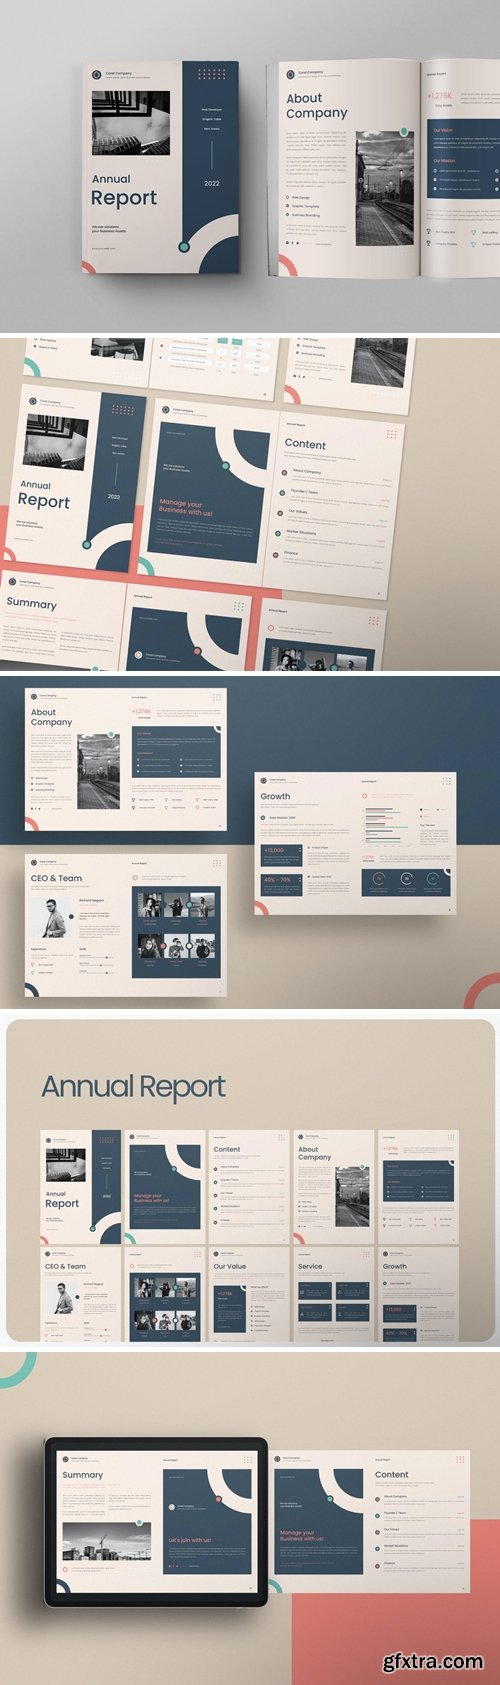 Annual Report 2021